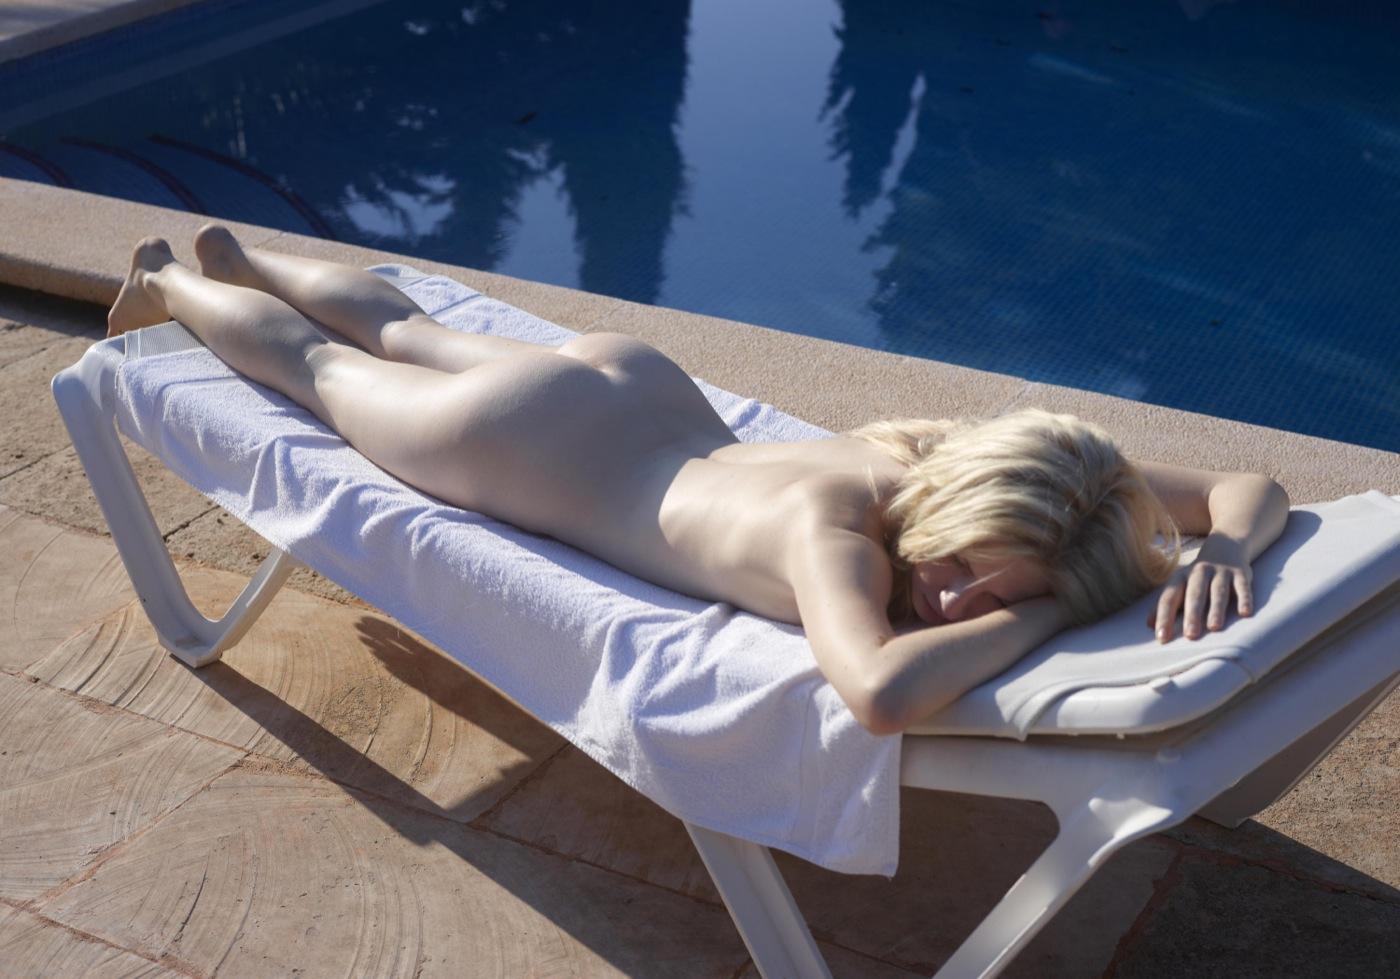 Nude sexy ass sunbath, karen plays nude dildo